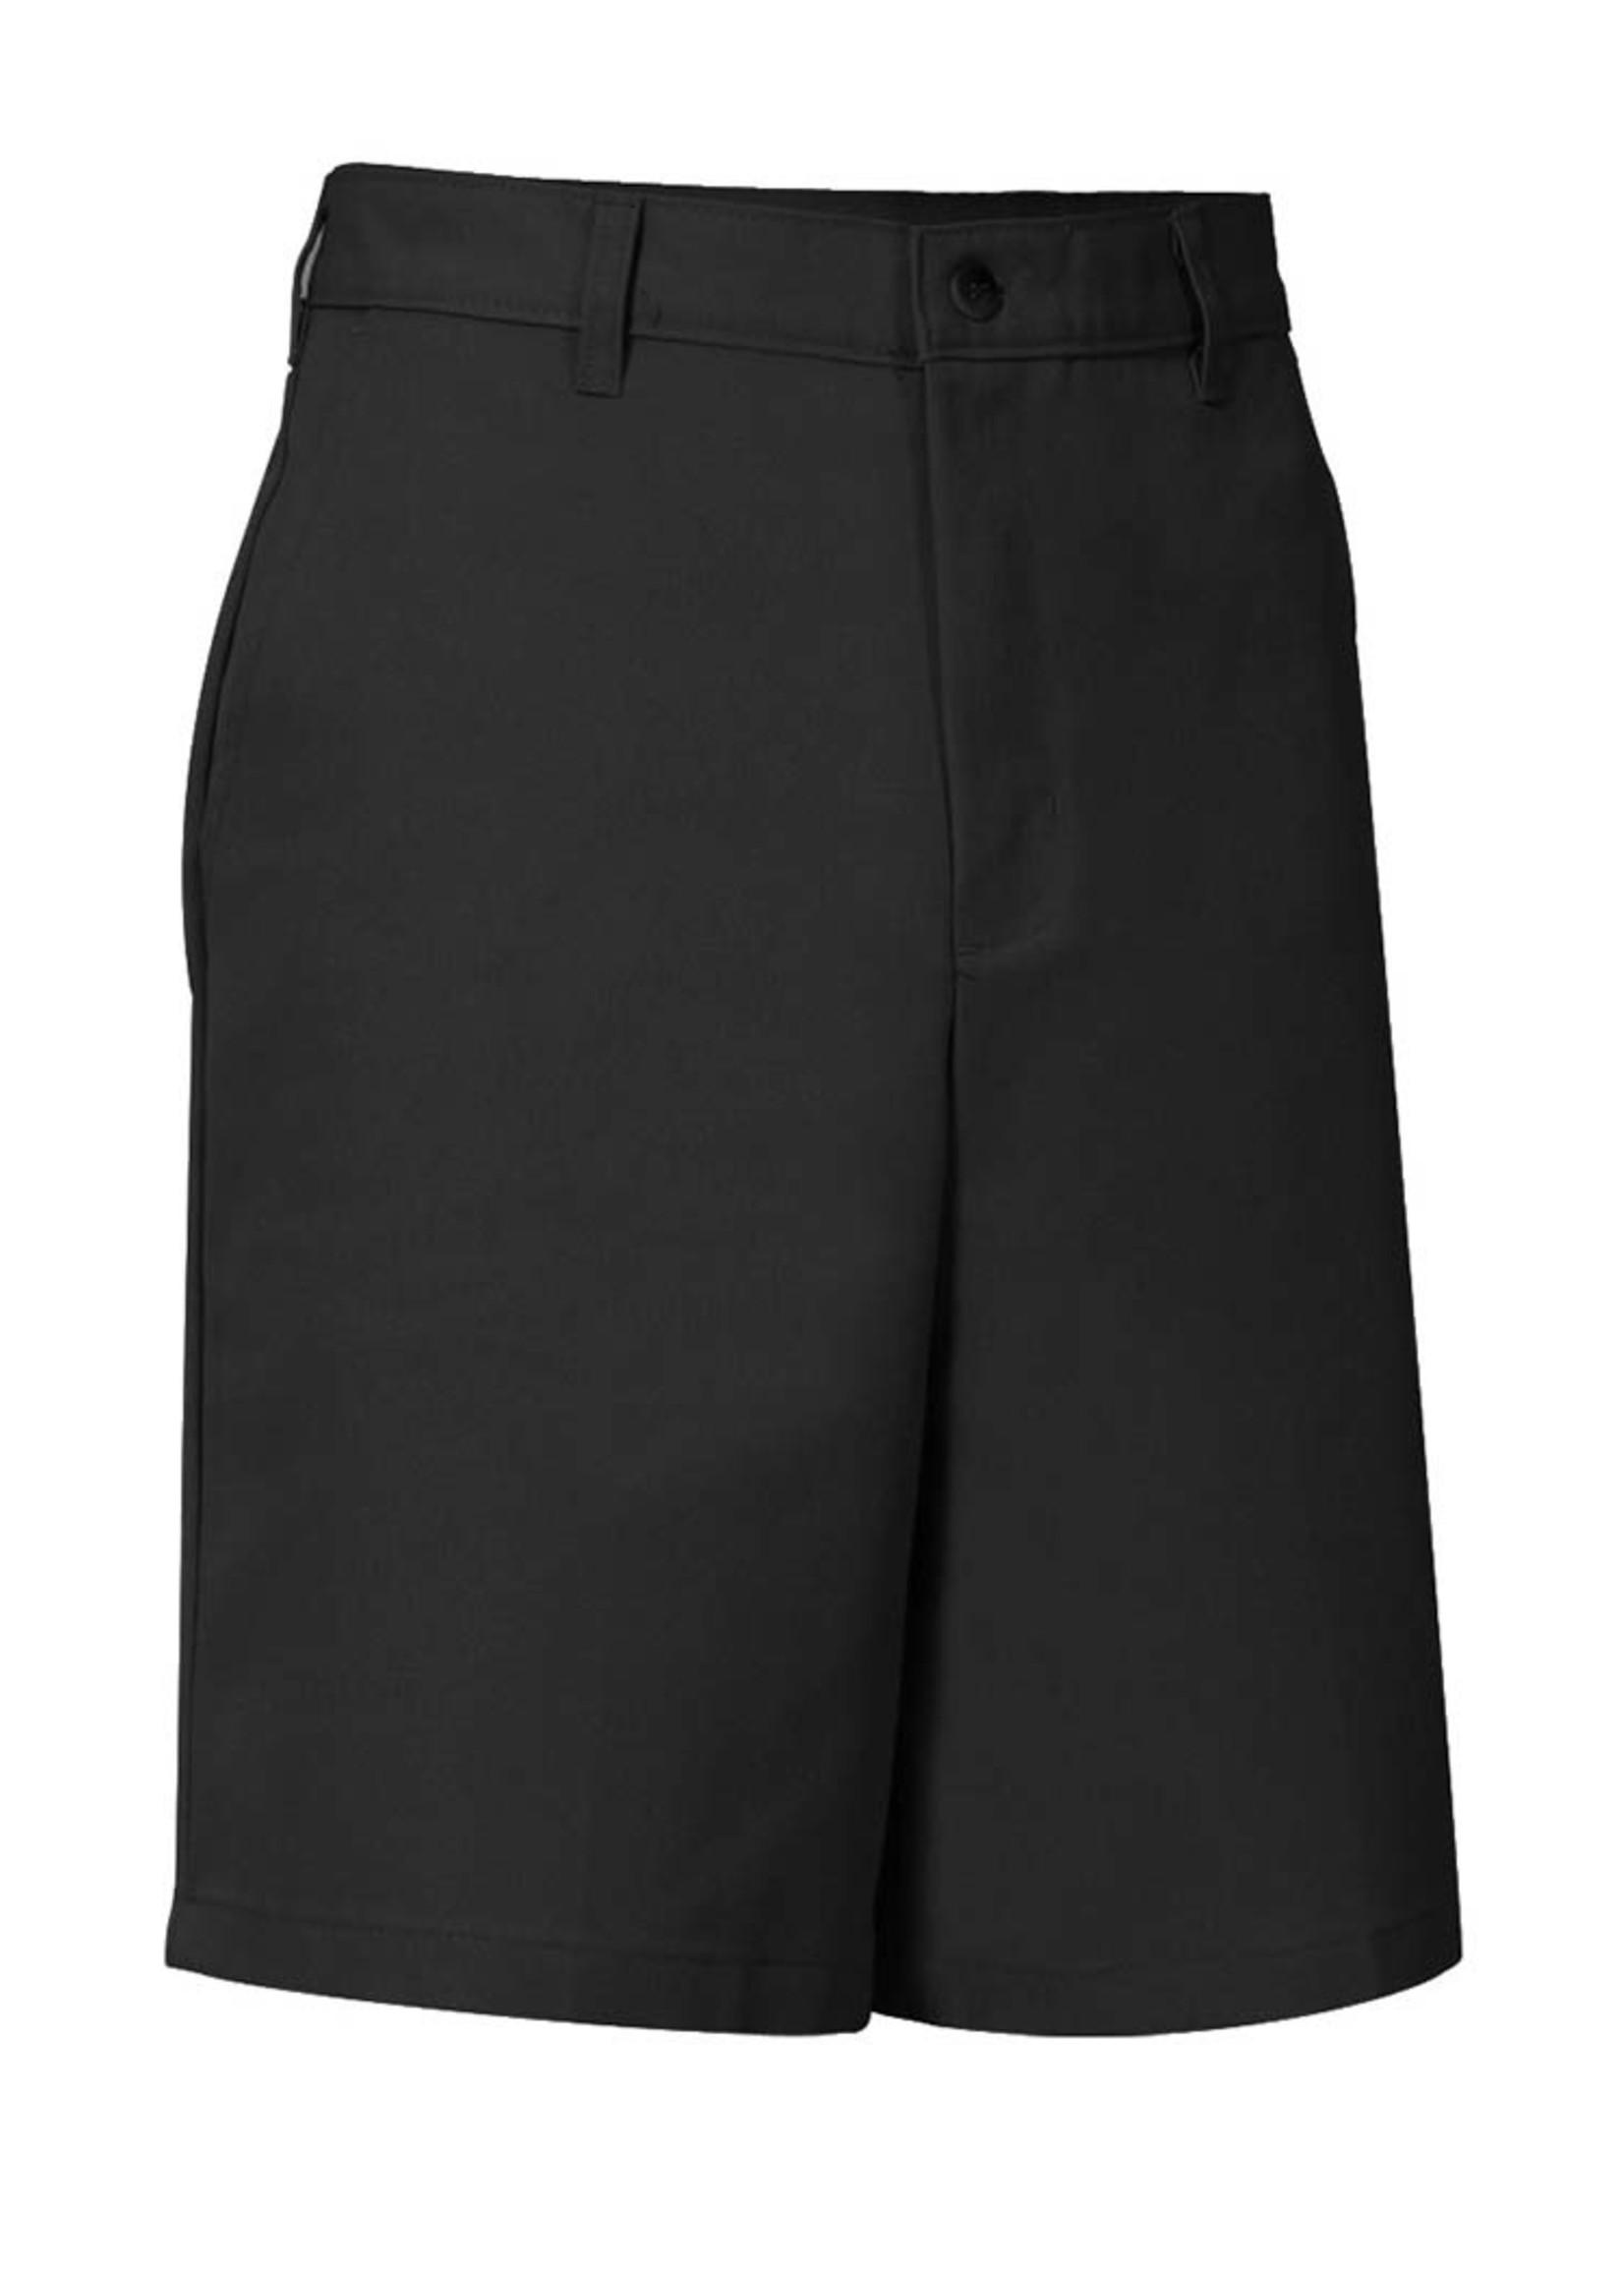 A+ Mens Flat Front Shorts (BK)